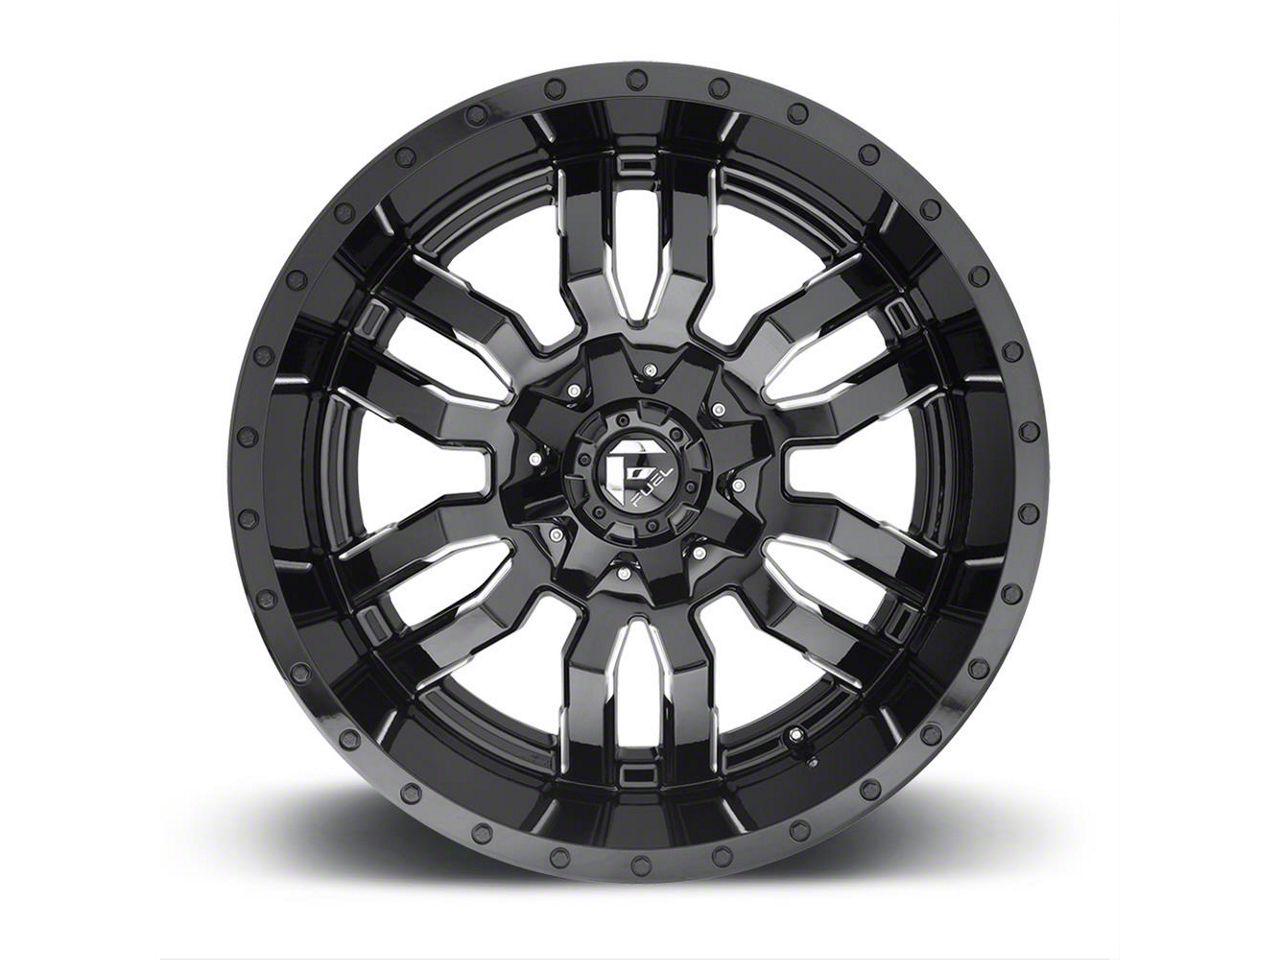 Fuel Wheels Sledge Gloss Black Milled 5-Lug Wheel - 20x9 (02-18 RAM 1500, Excluding Mega Cab)